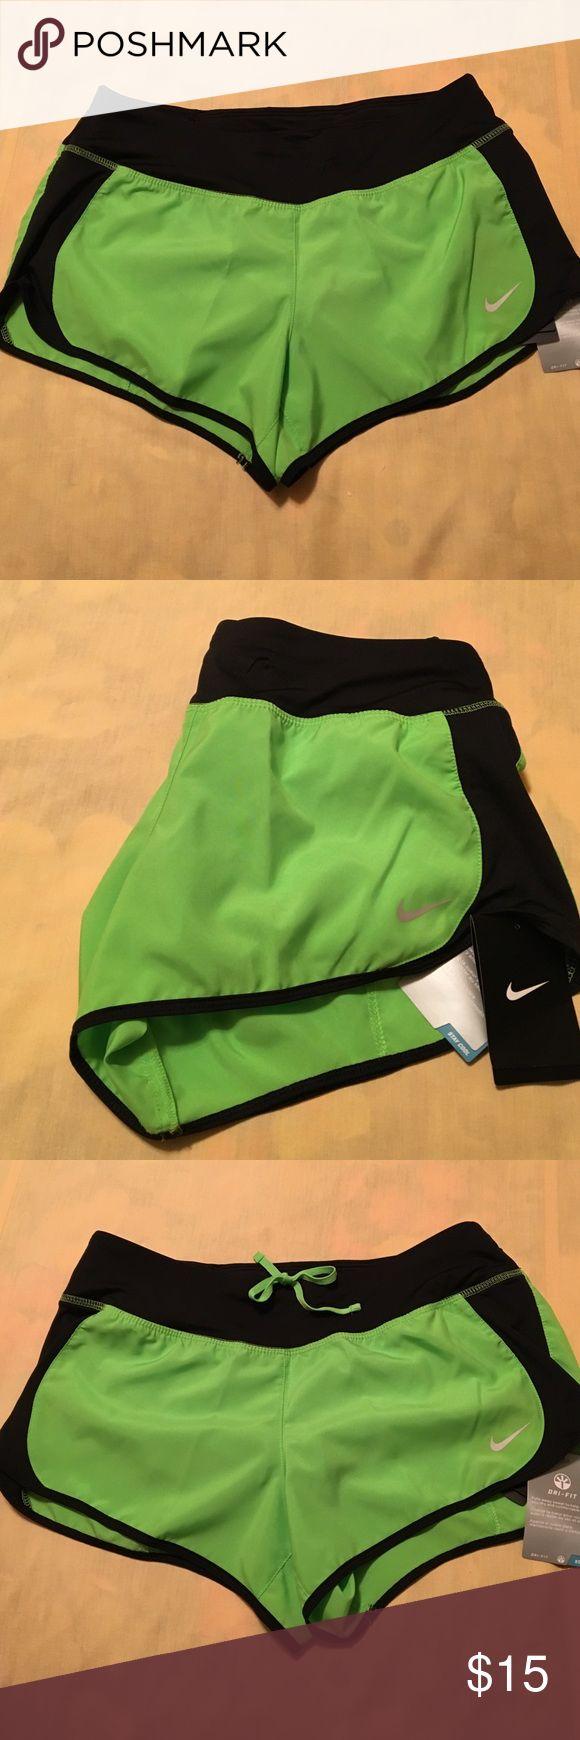 NWT NIKE Dri-Fit Stay Cool Shorts NWT NIKE Dri-Fit Stay Cool Shorts w/inside attached panty and drawstring waist.  Lime green and black. Size M Nike Shorts